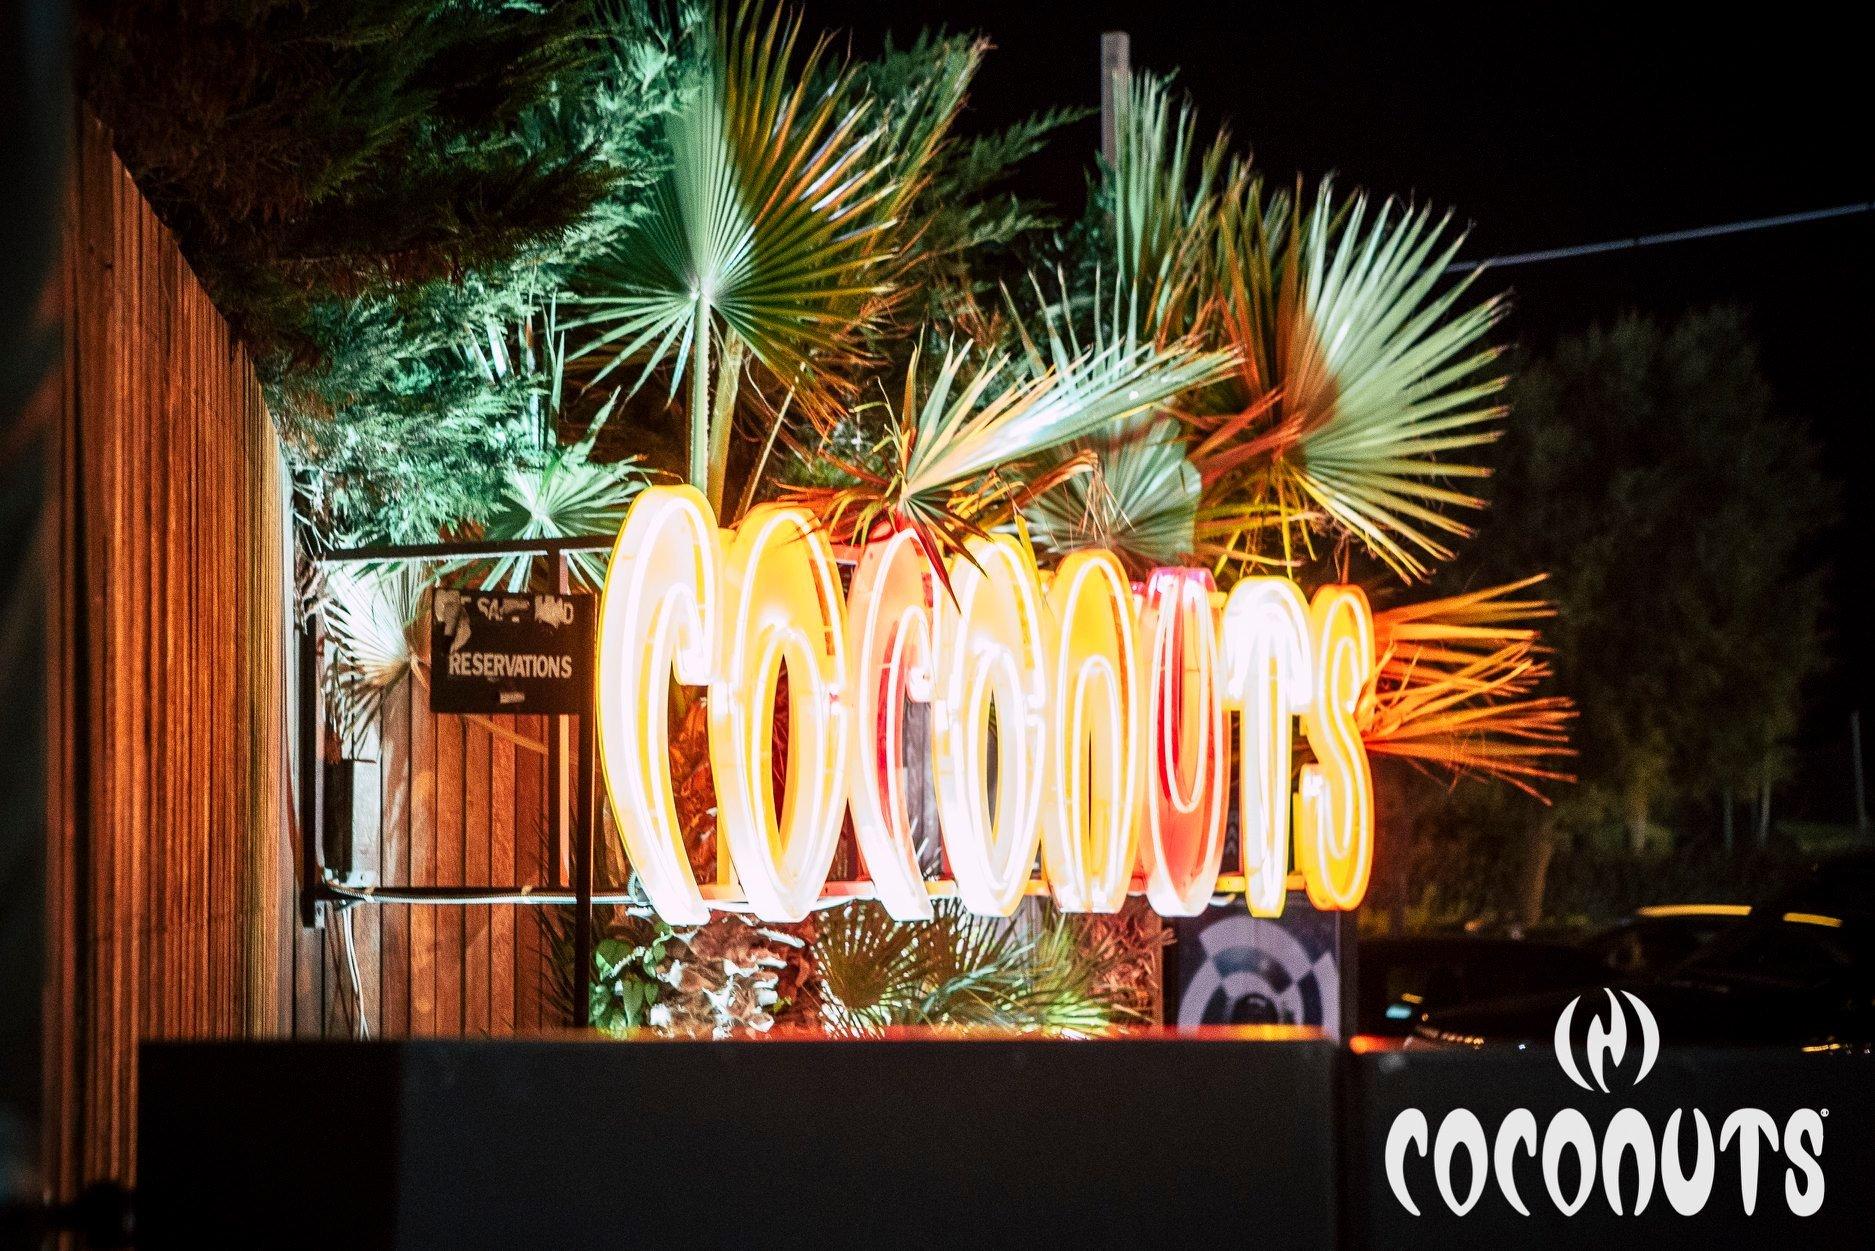 Discoteca Coconuts, la movida di Rimini